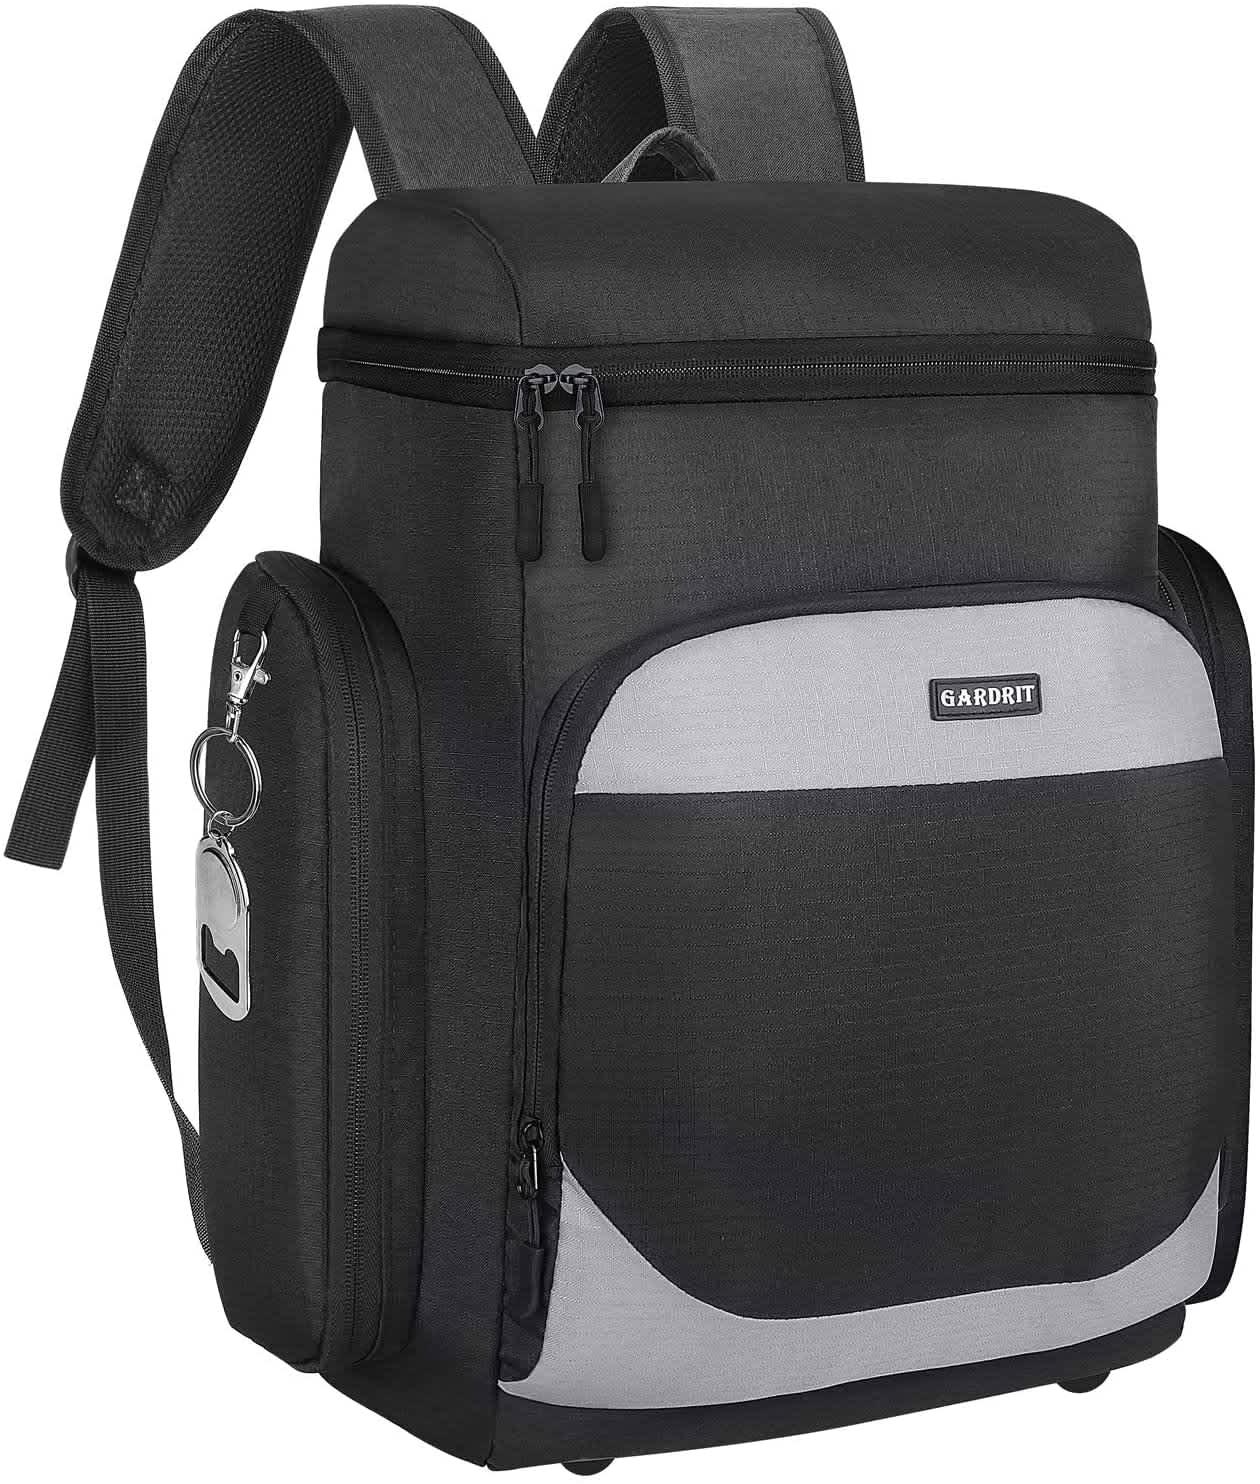 Gardrit Insulated Cooler Backpack